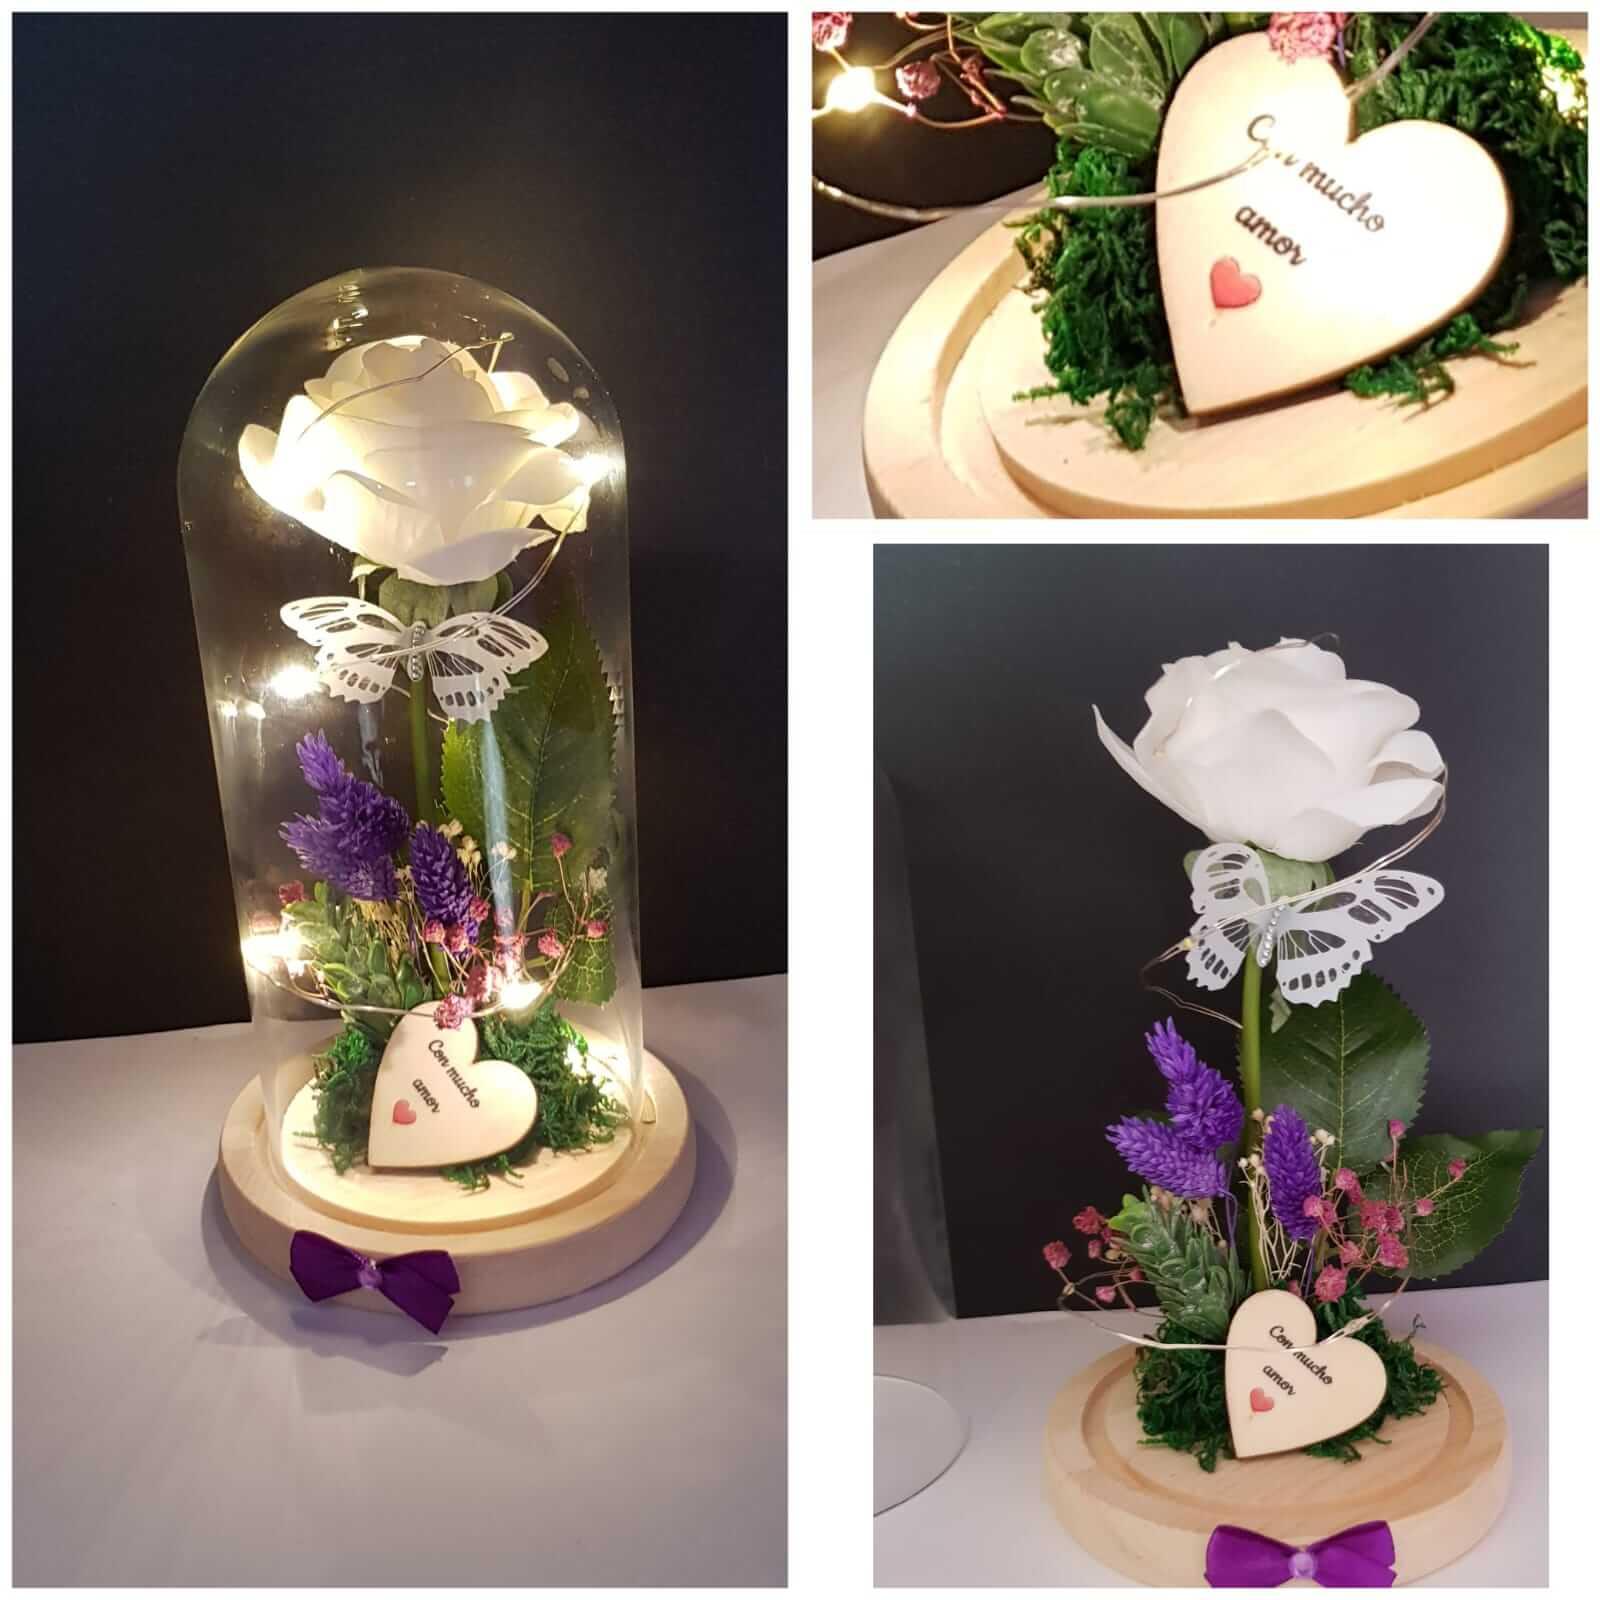 cupula de cristal cupula de cristal - Cupula de cristal 1 - Cupula de cristal